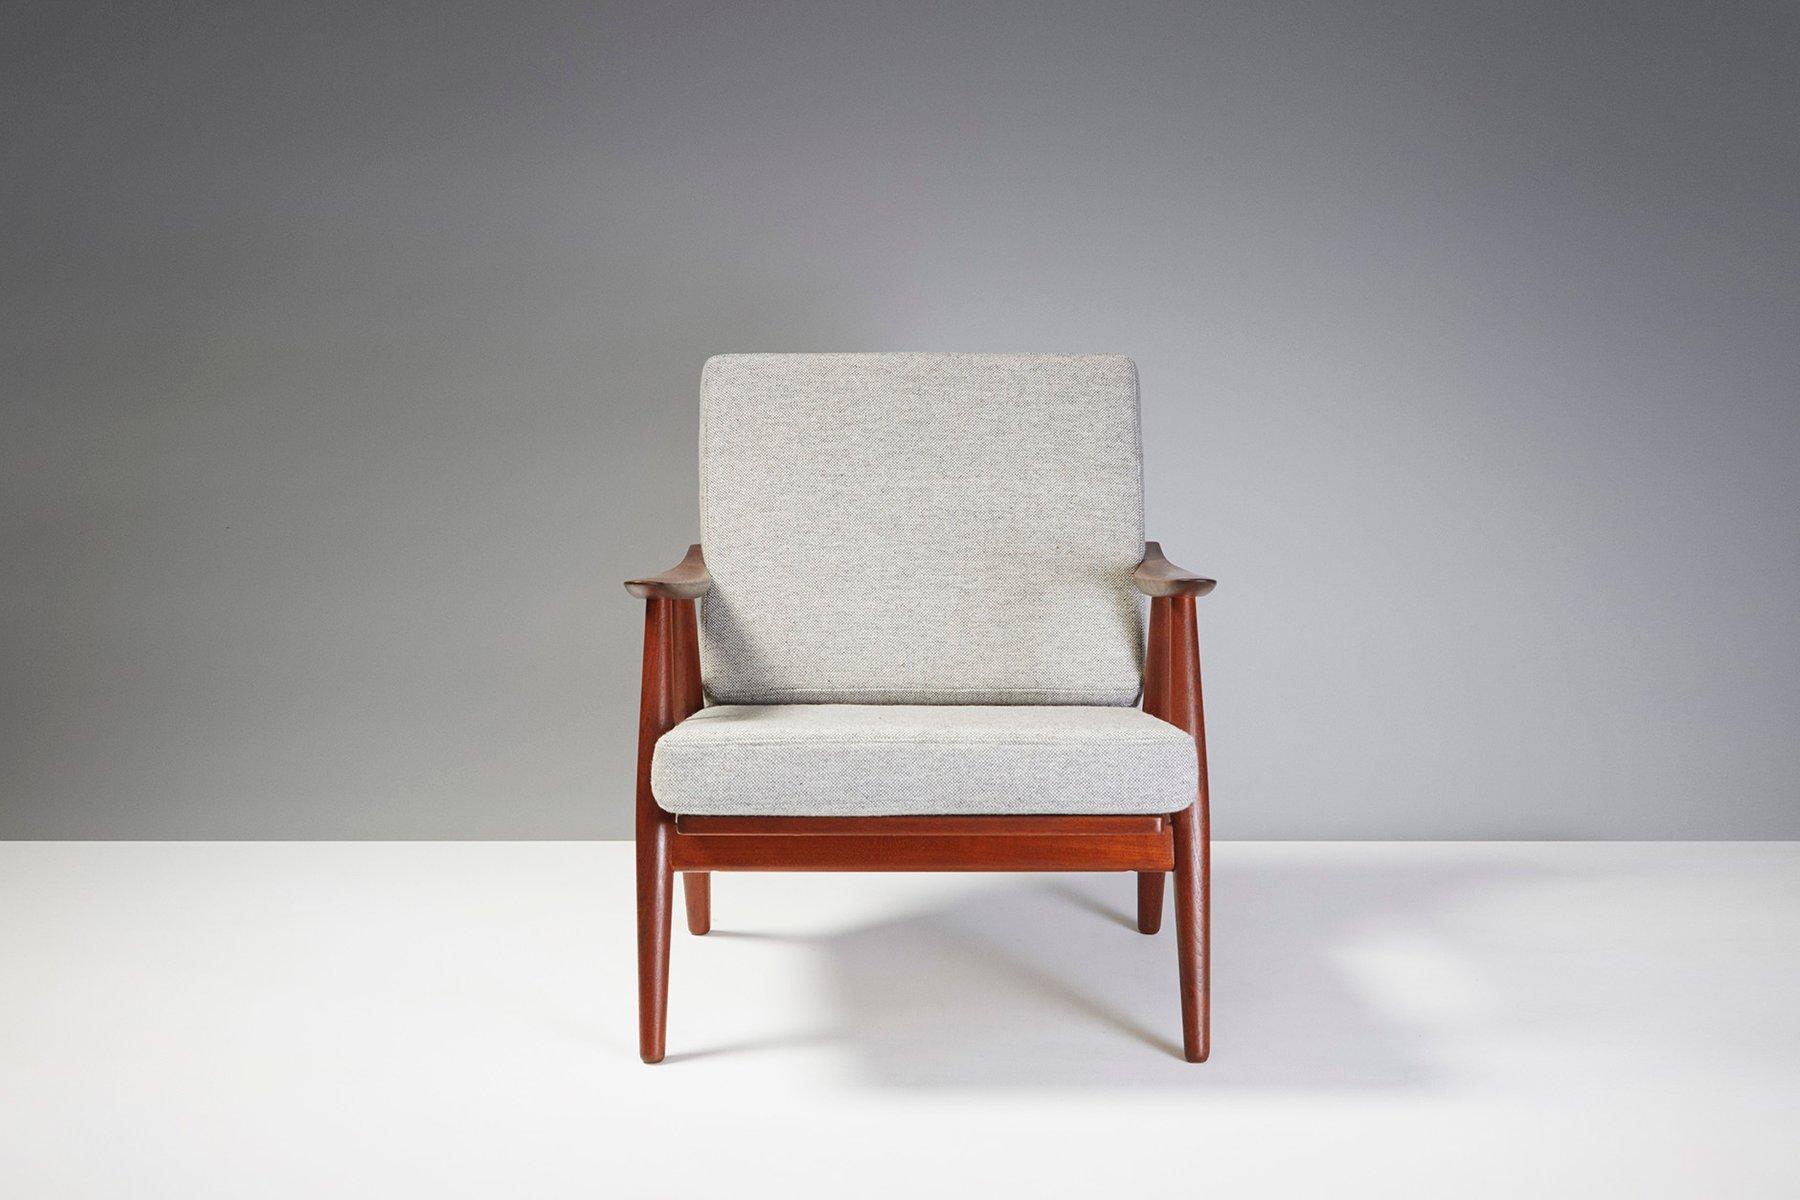 ge 270 teak sessel von hans j wegner 1956 bei pamono kaufen. Black Bedroom Furniture Sets. Home Design Ideas